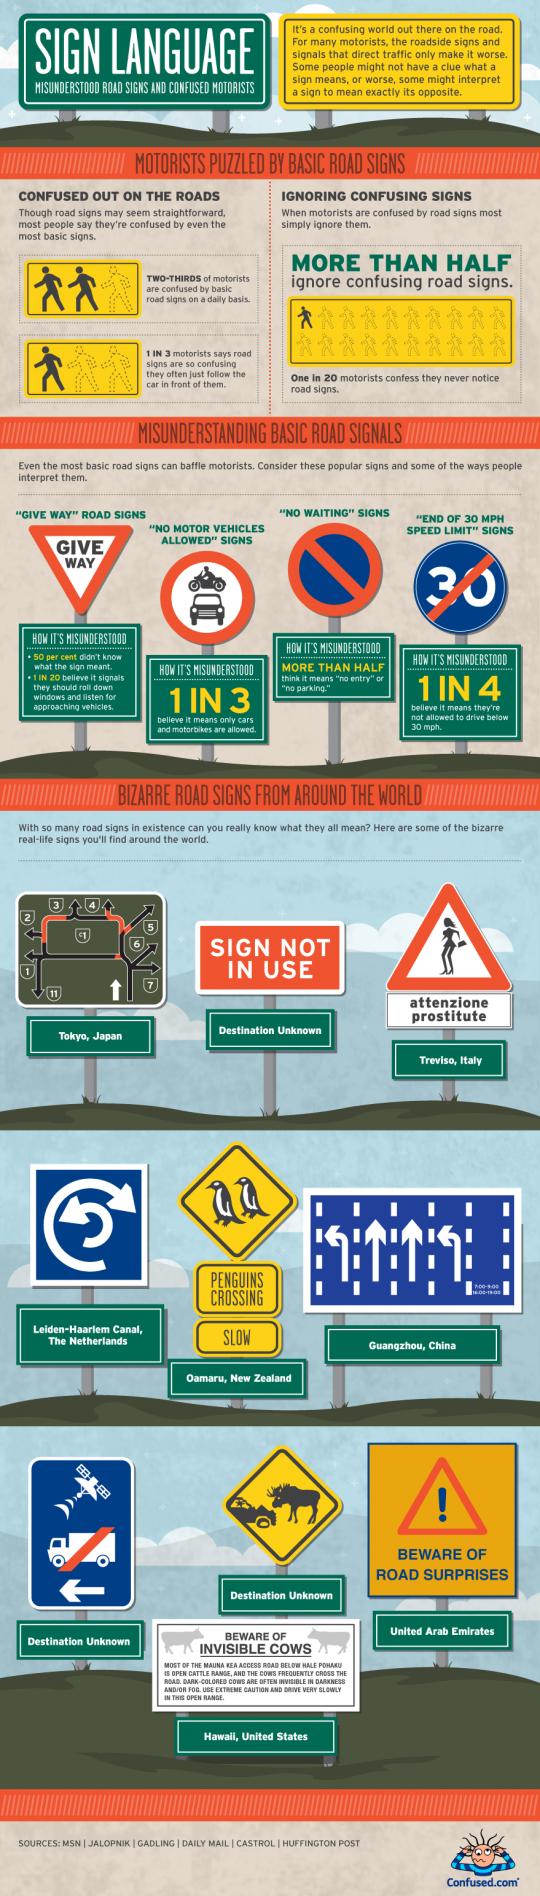 Misunderstood Road Signs and Confused Motorists